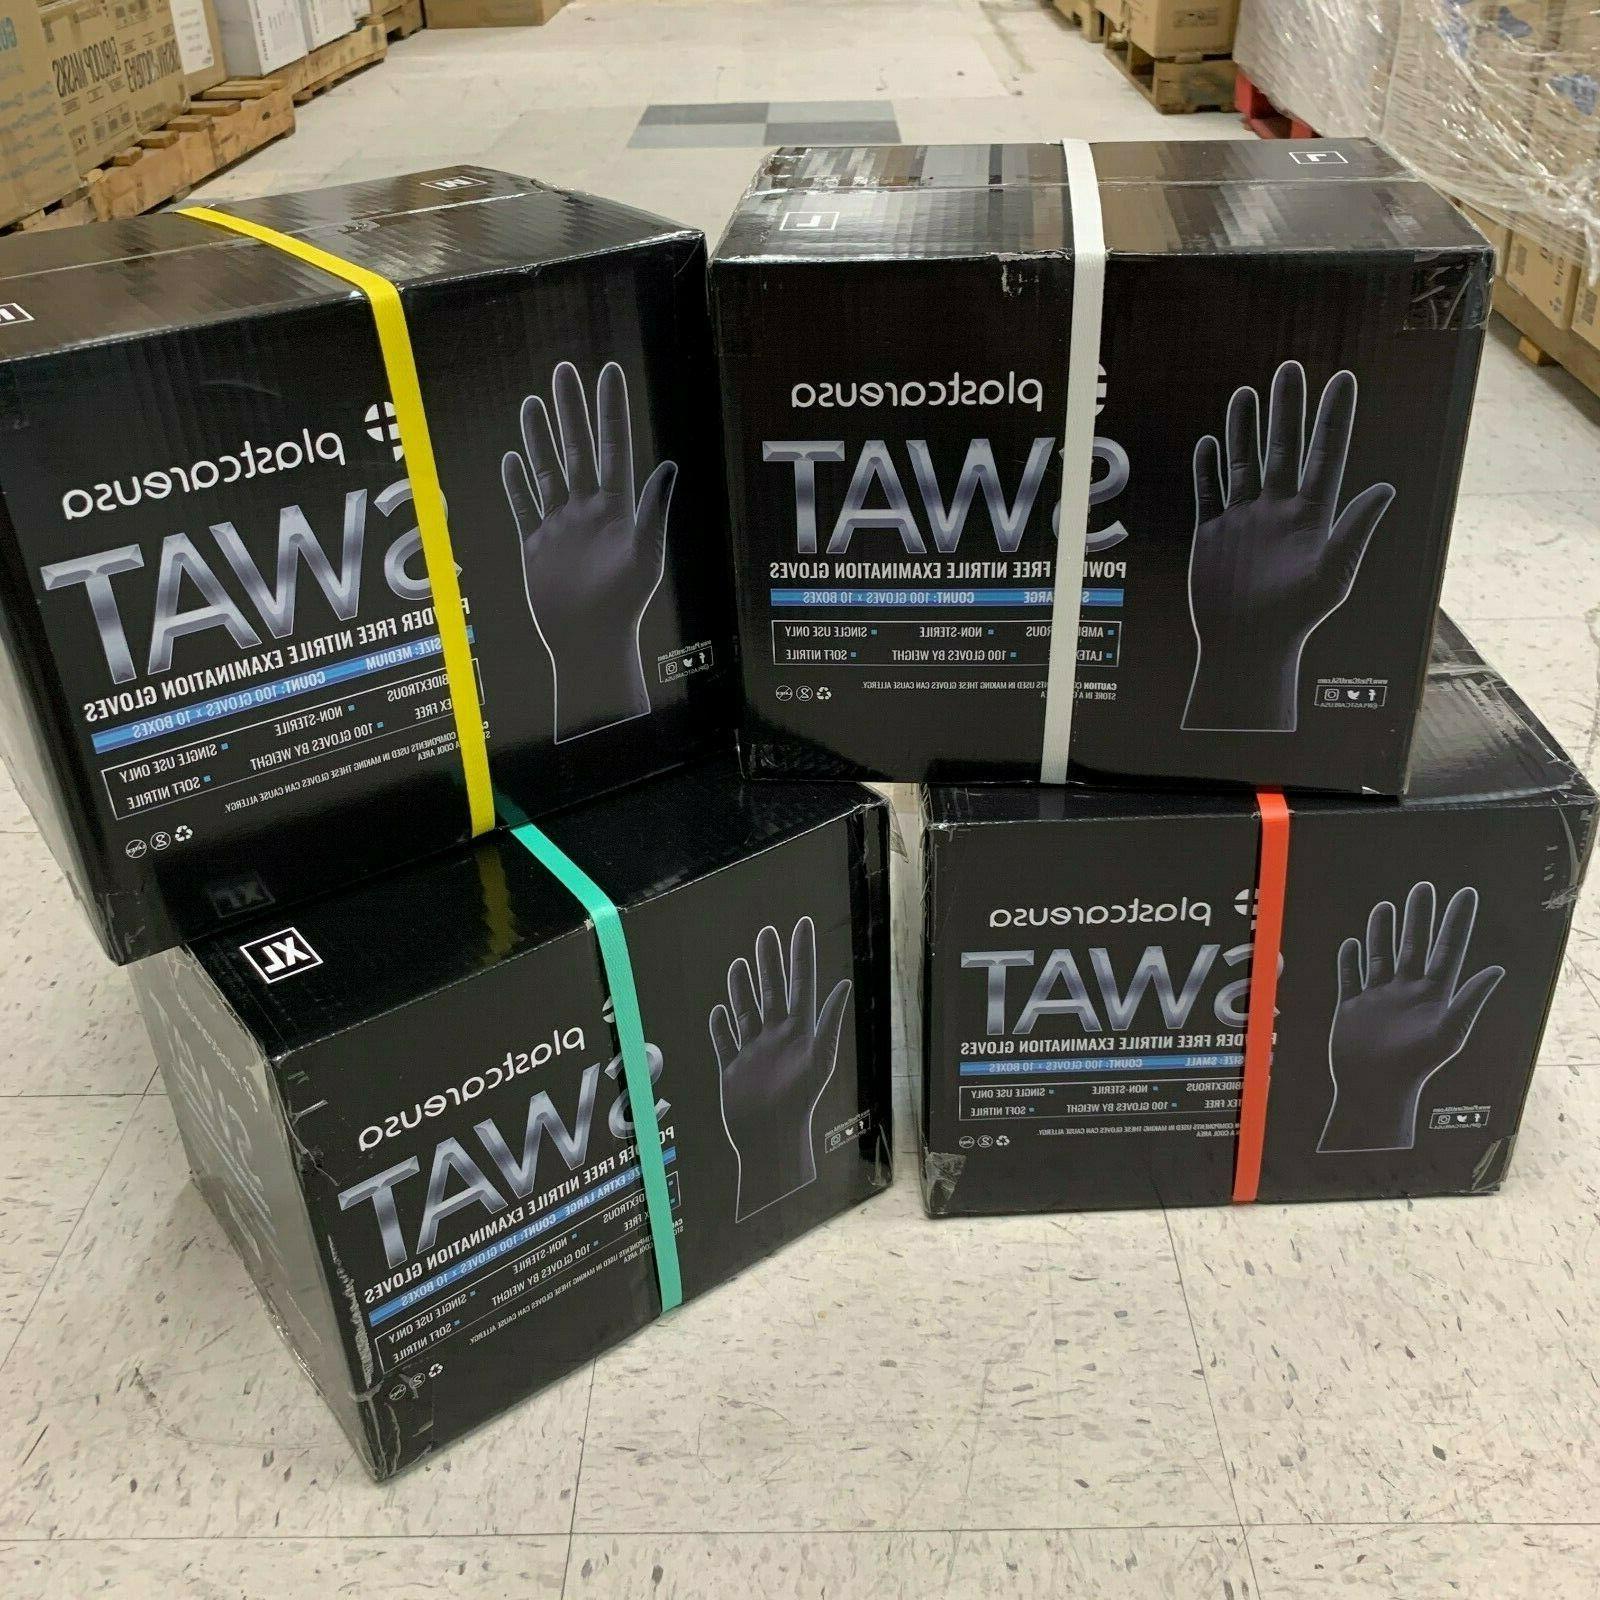 Black Nitrile Tattoo EXAM Food Cleaning Gloves Powder/Latex